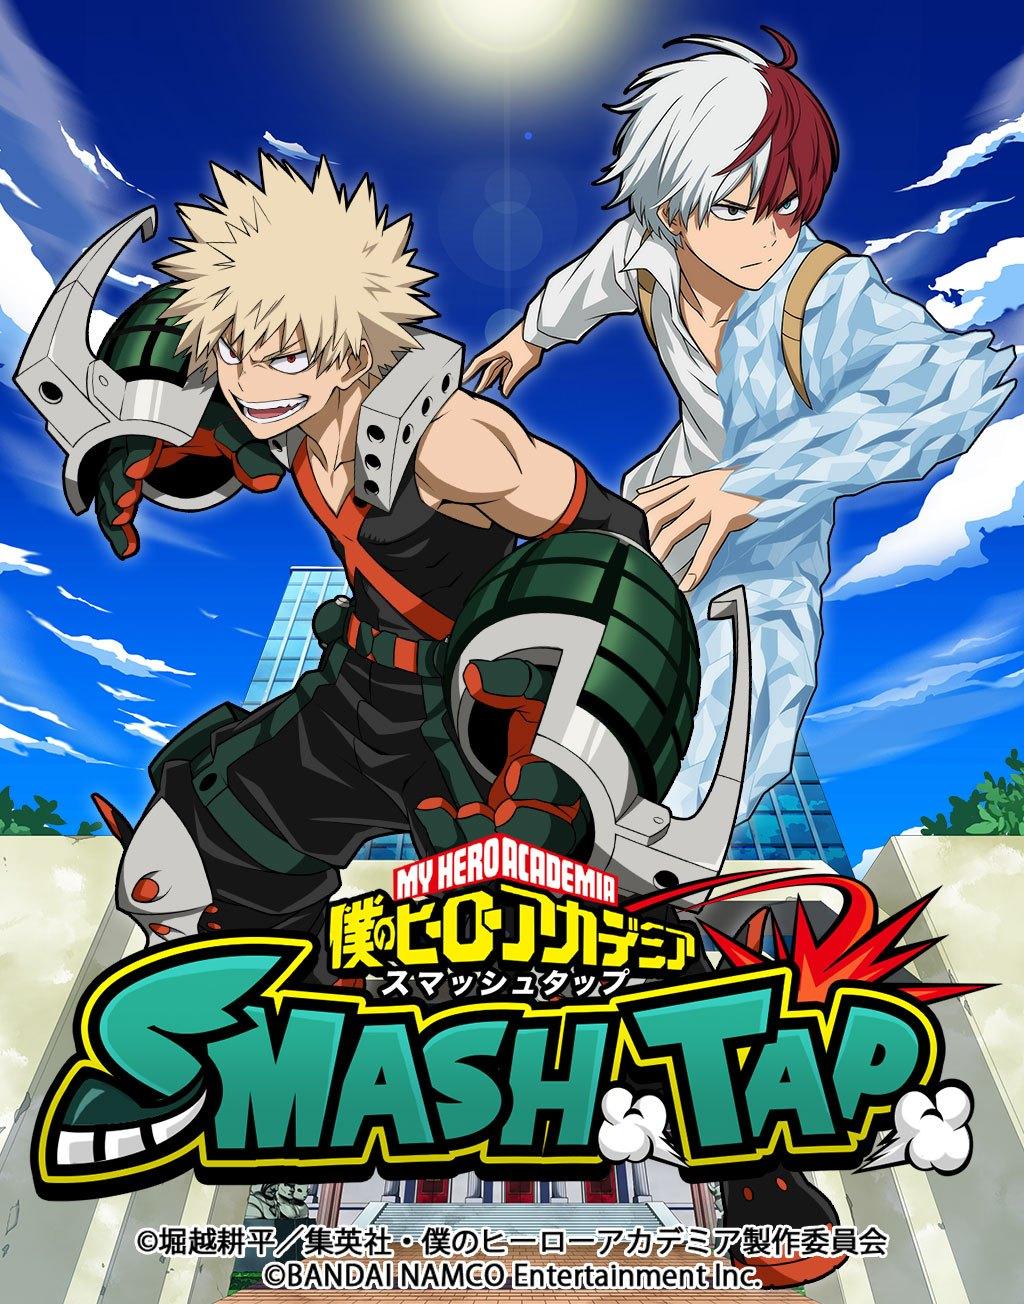 My Hero Academia_Smash Tap 00